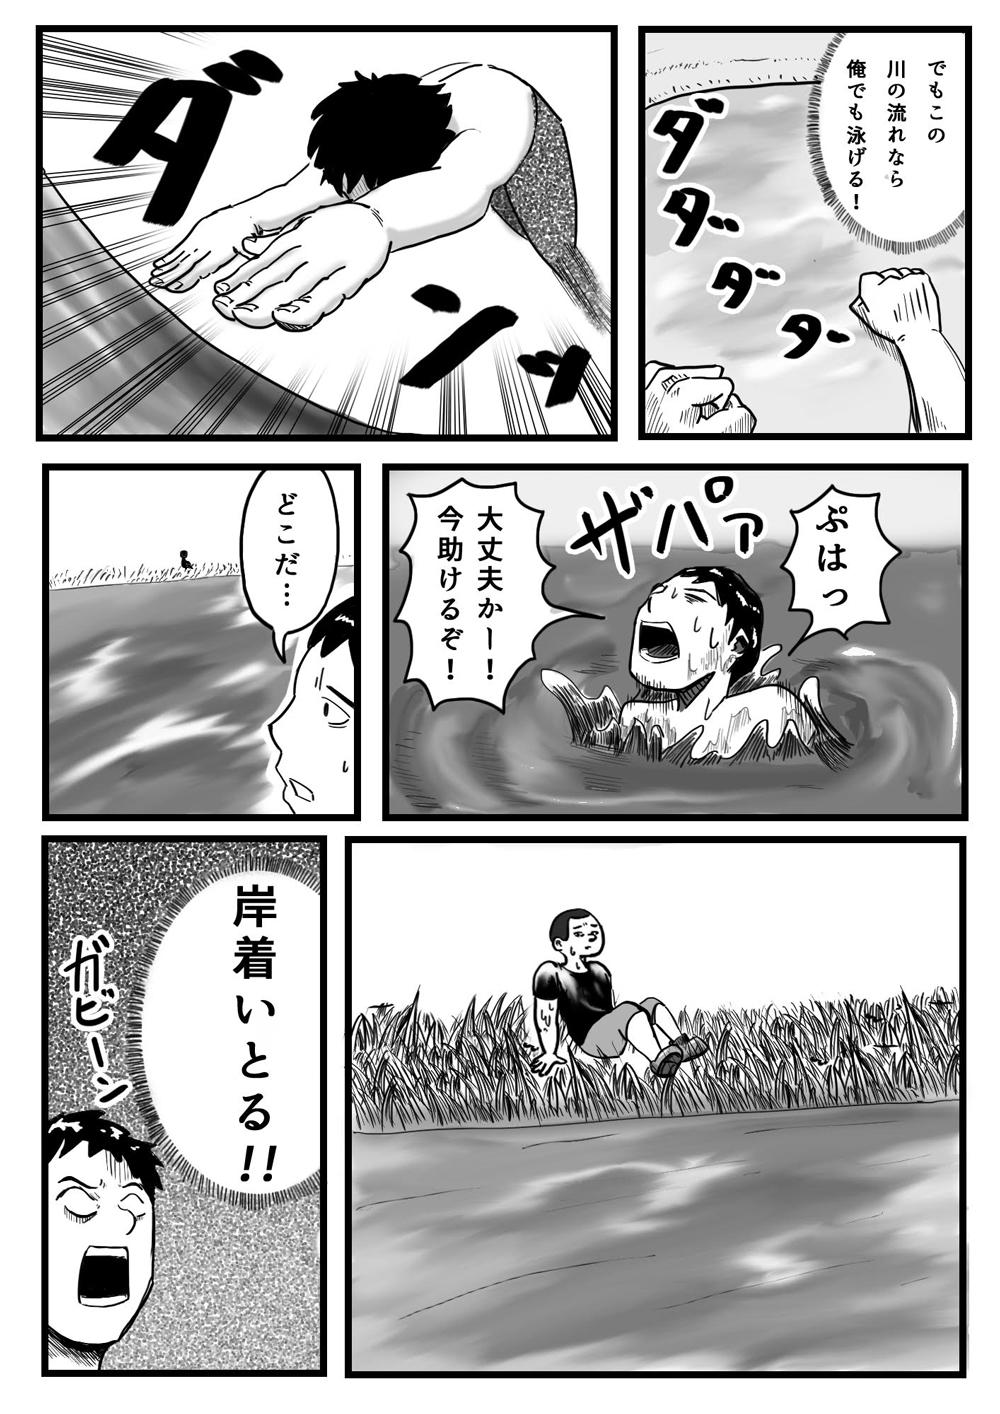 arnolds-hasegawa-002-5